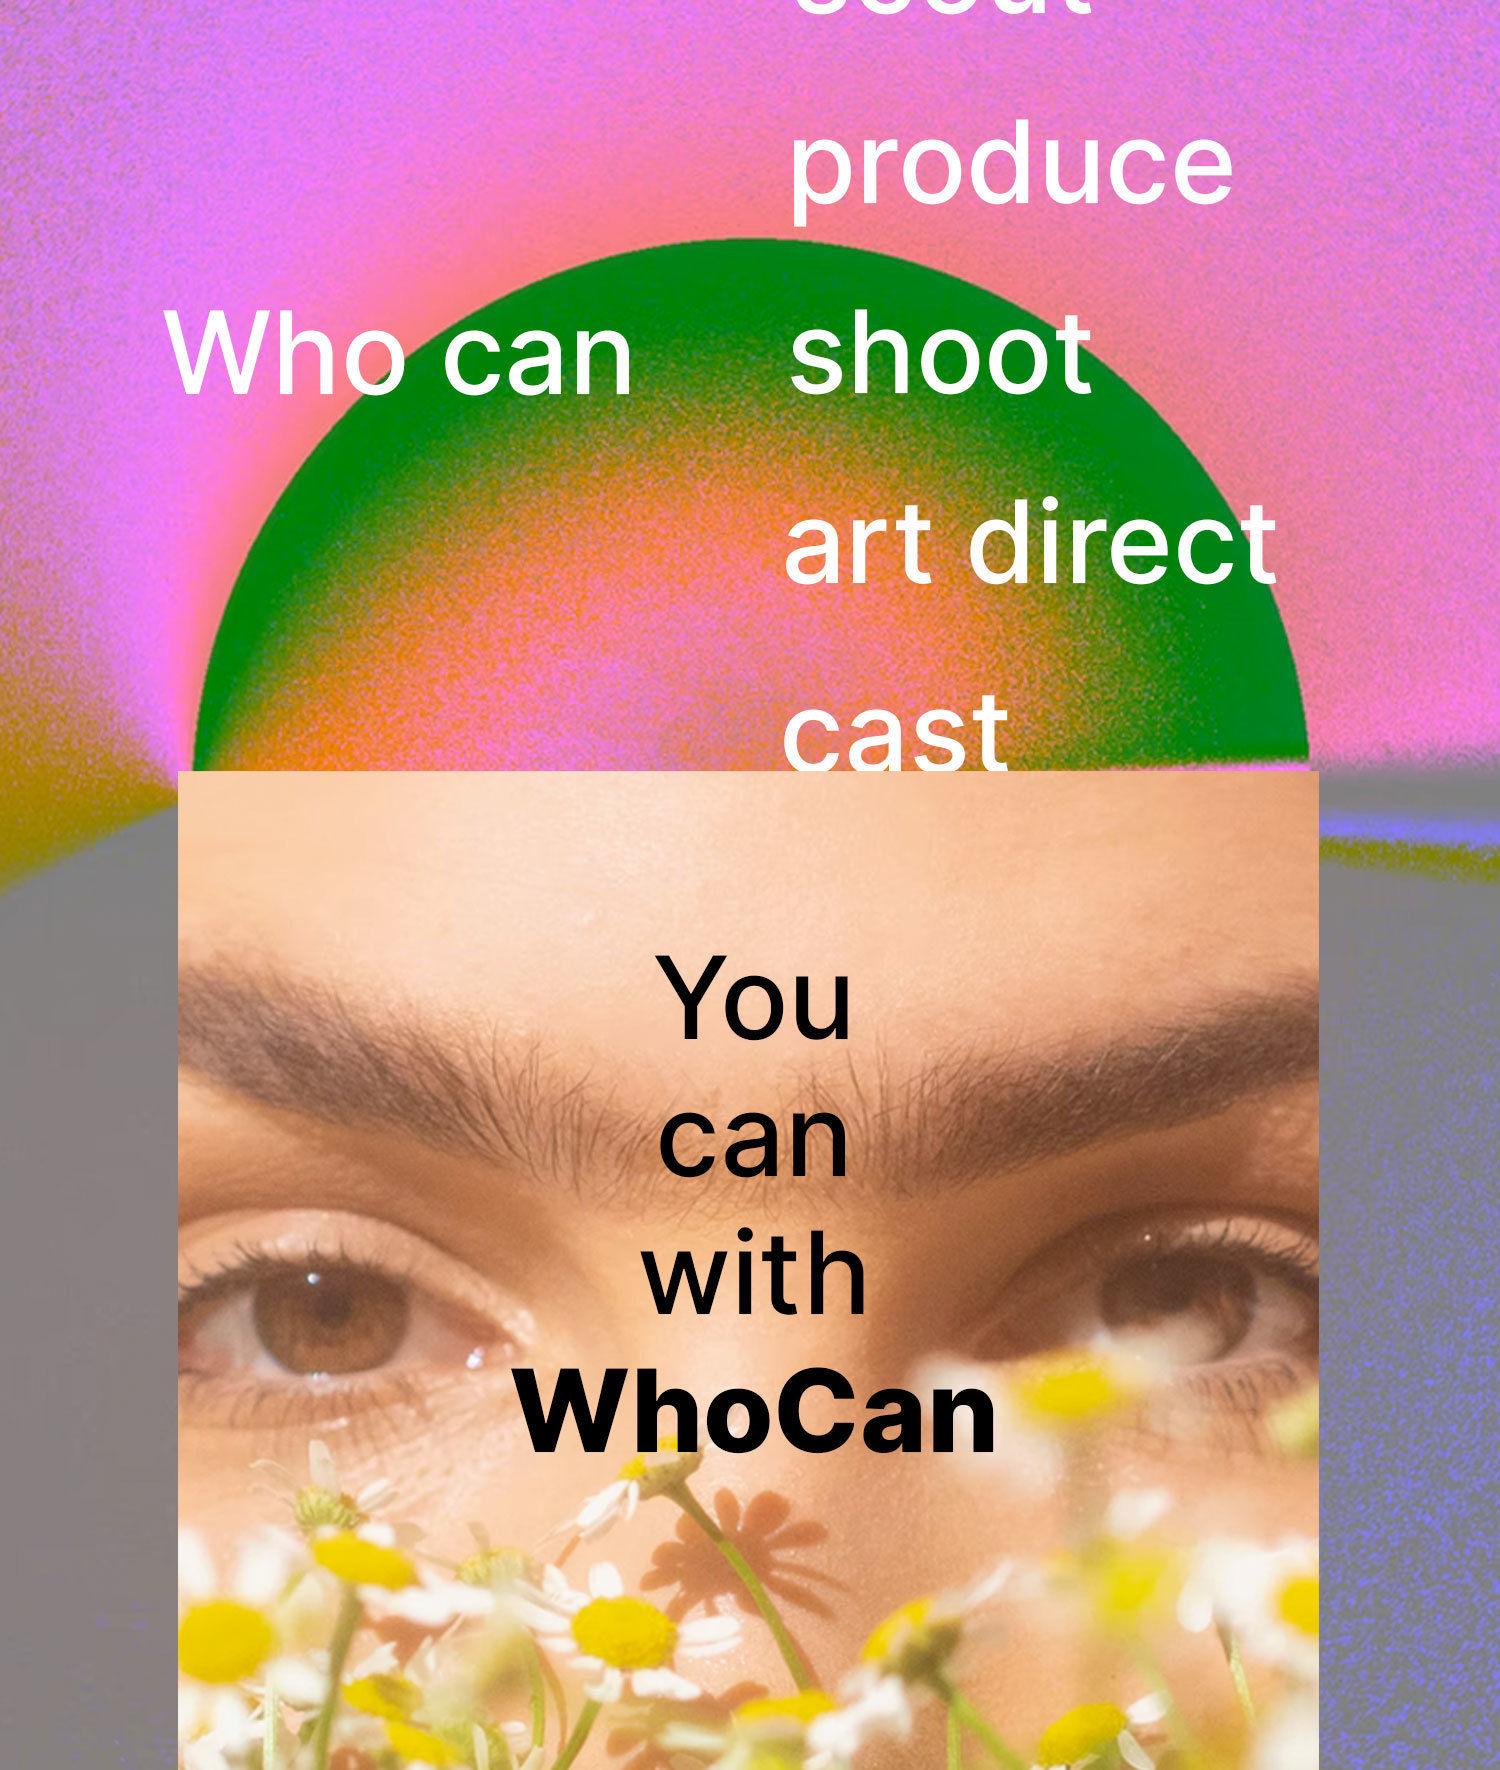 WHOCAN